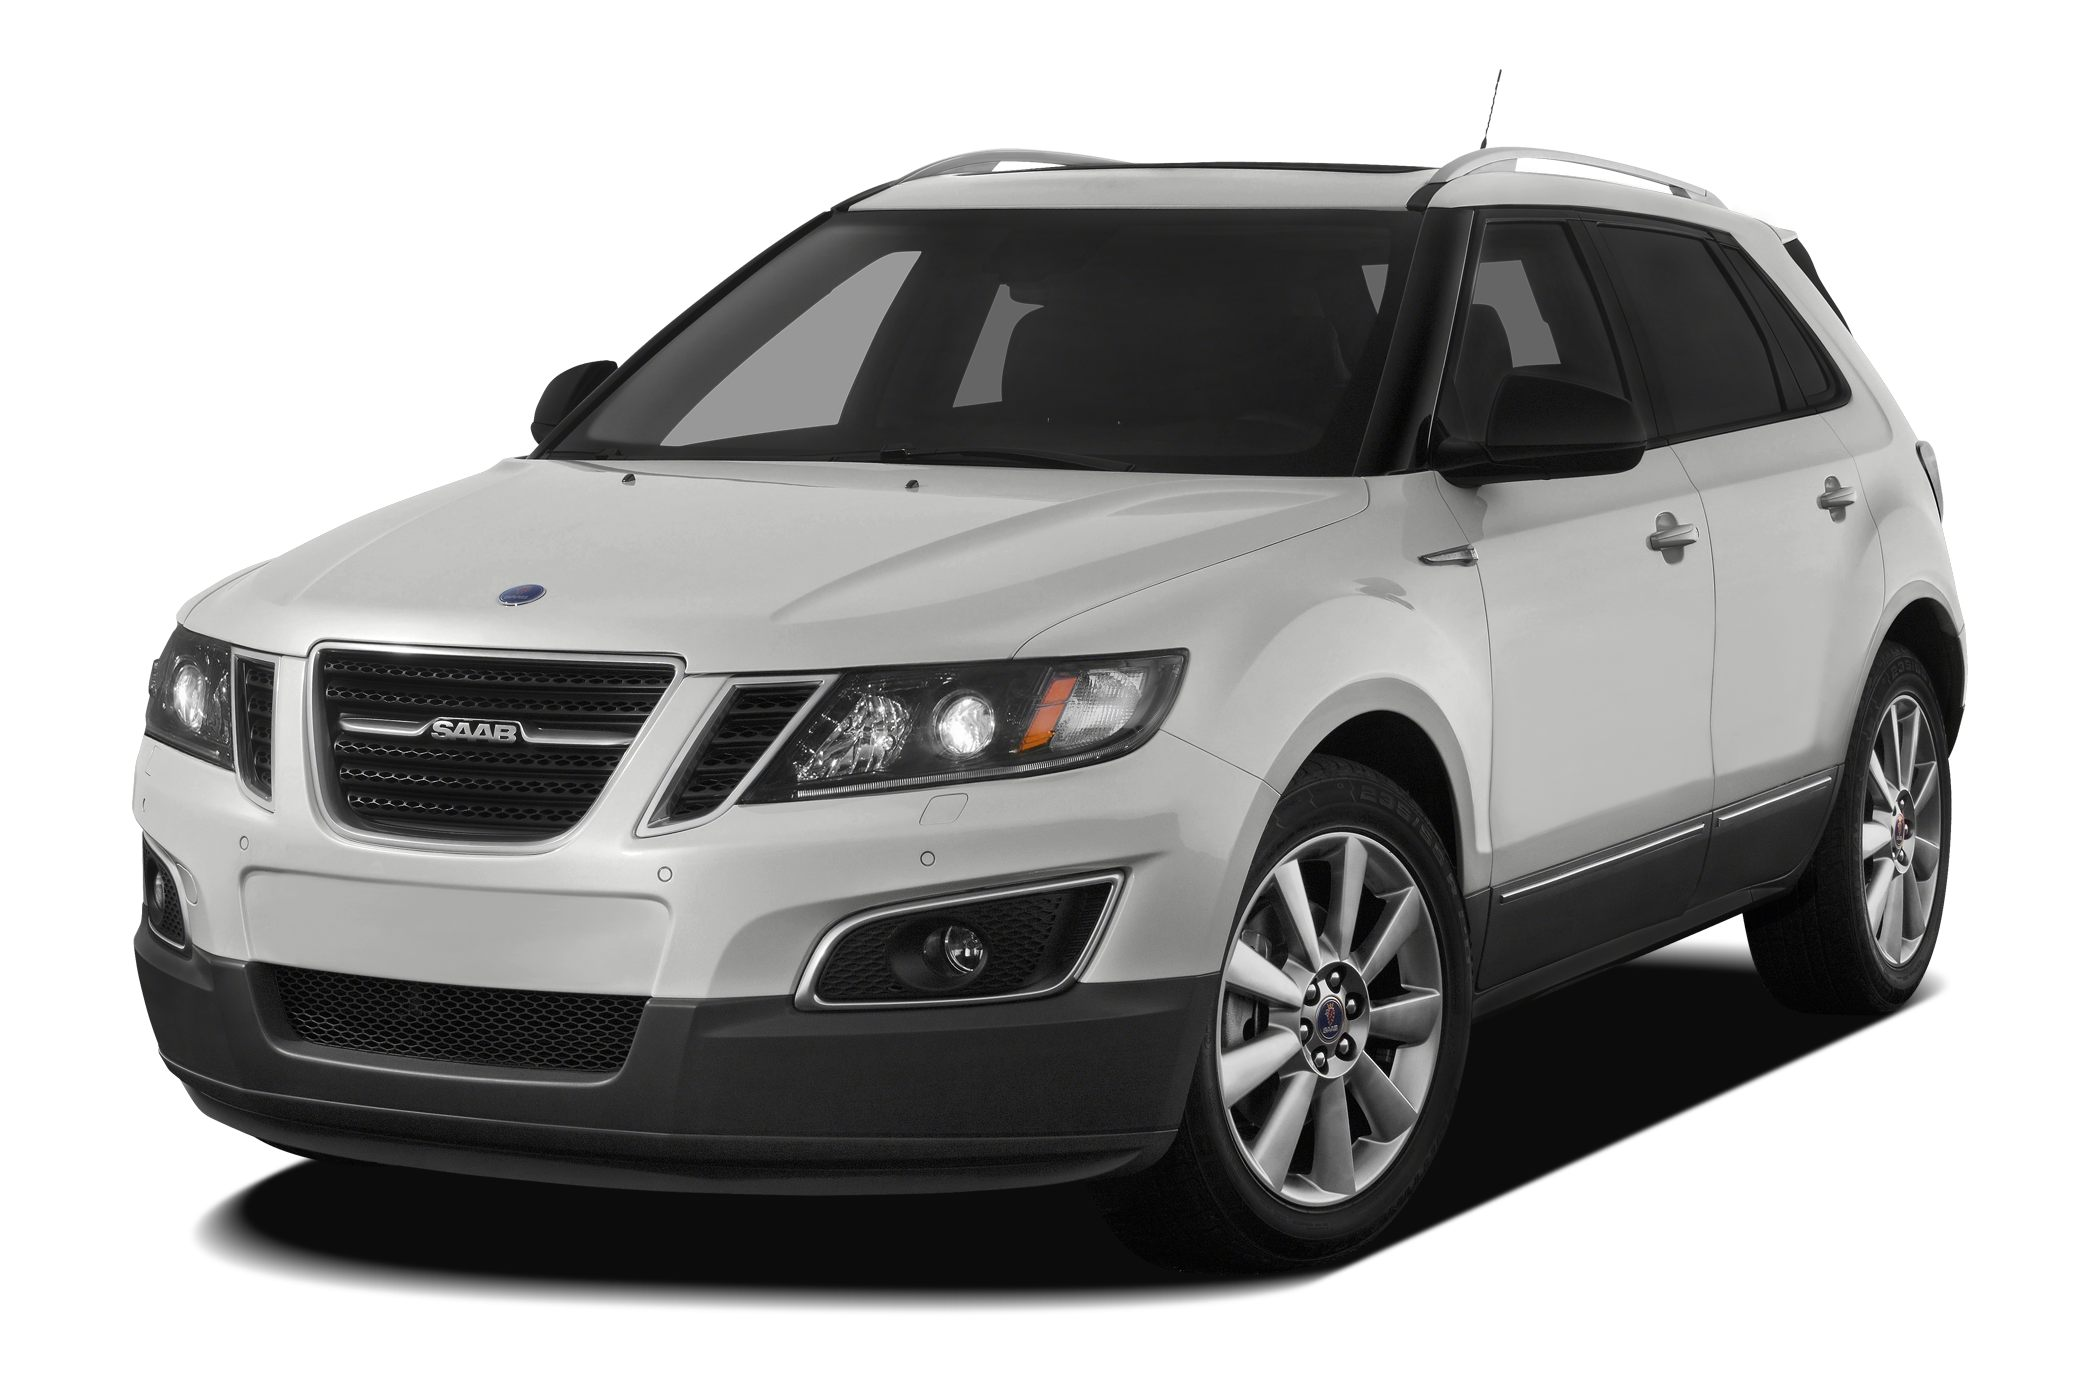 saab 9-5 wagon 2011 models - Auto-Database.com